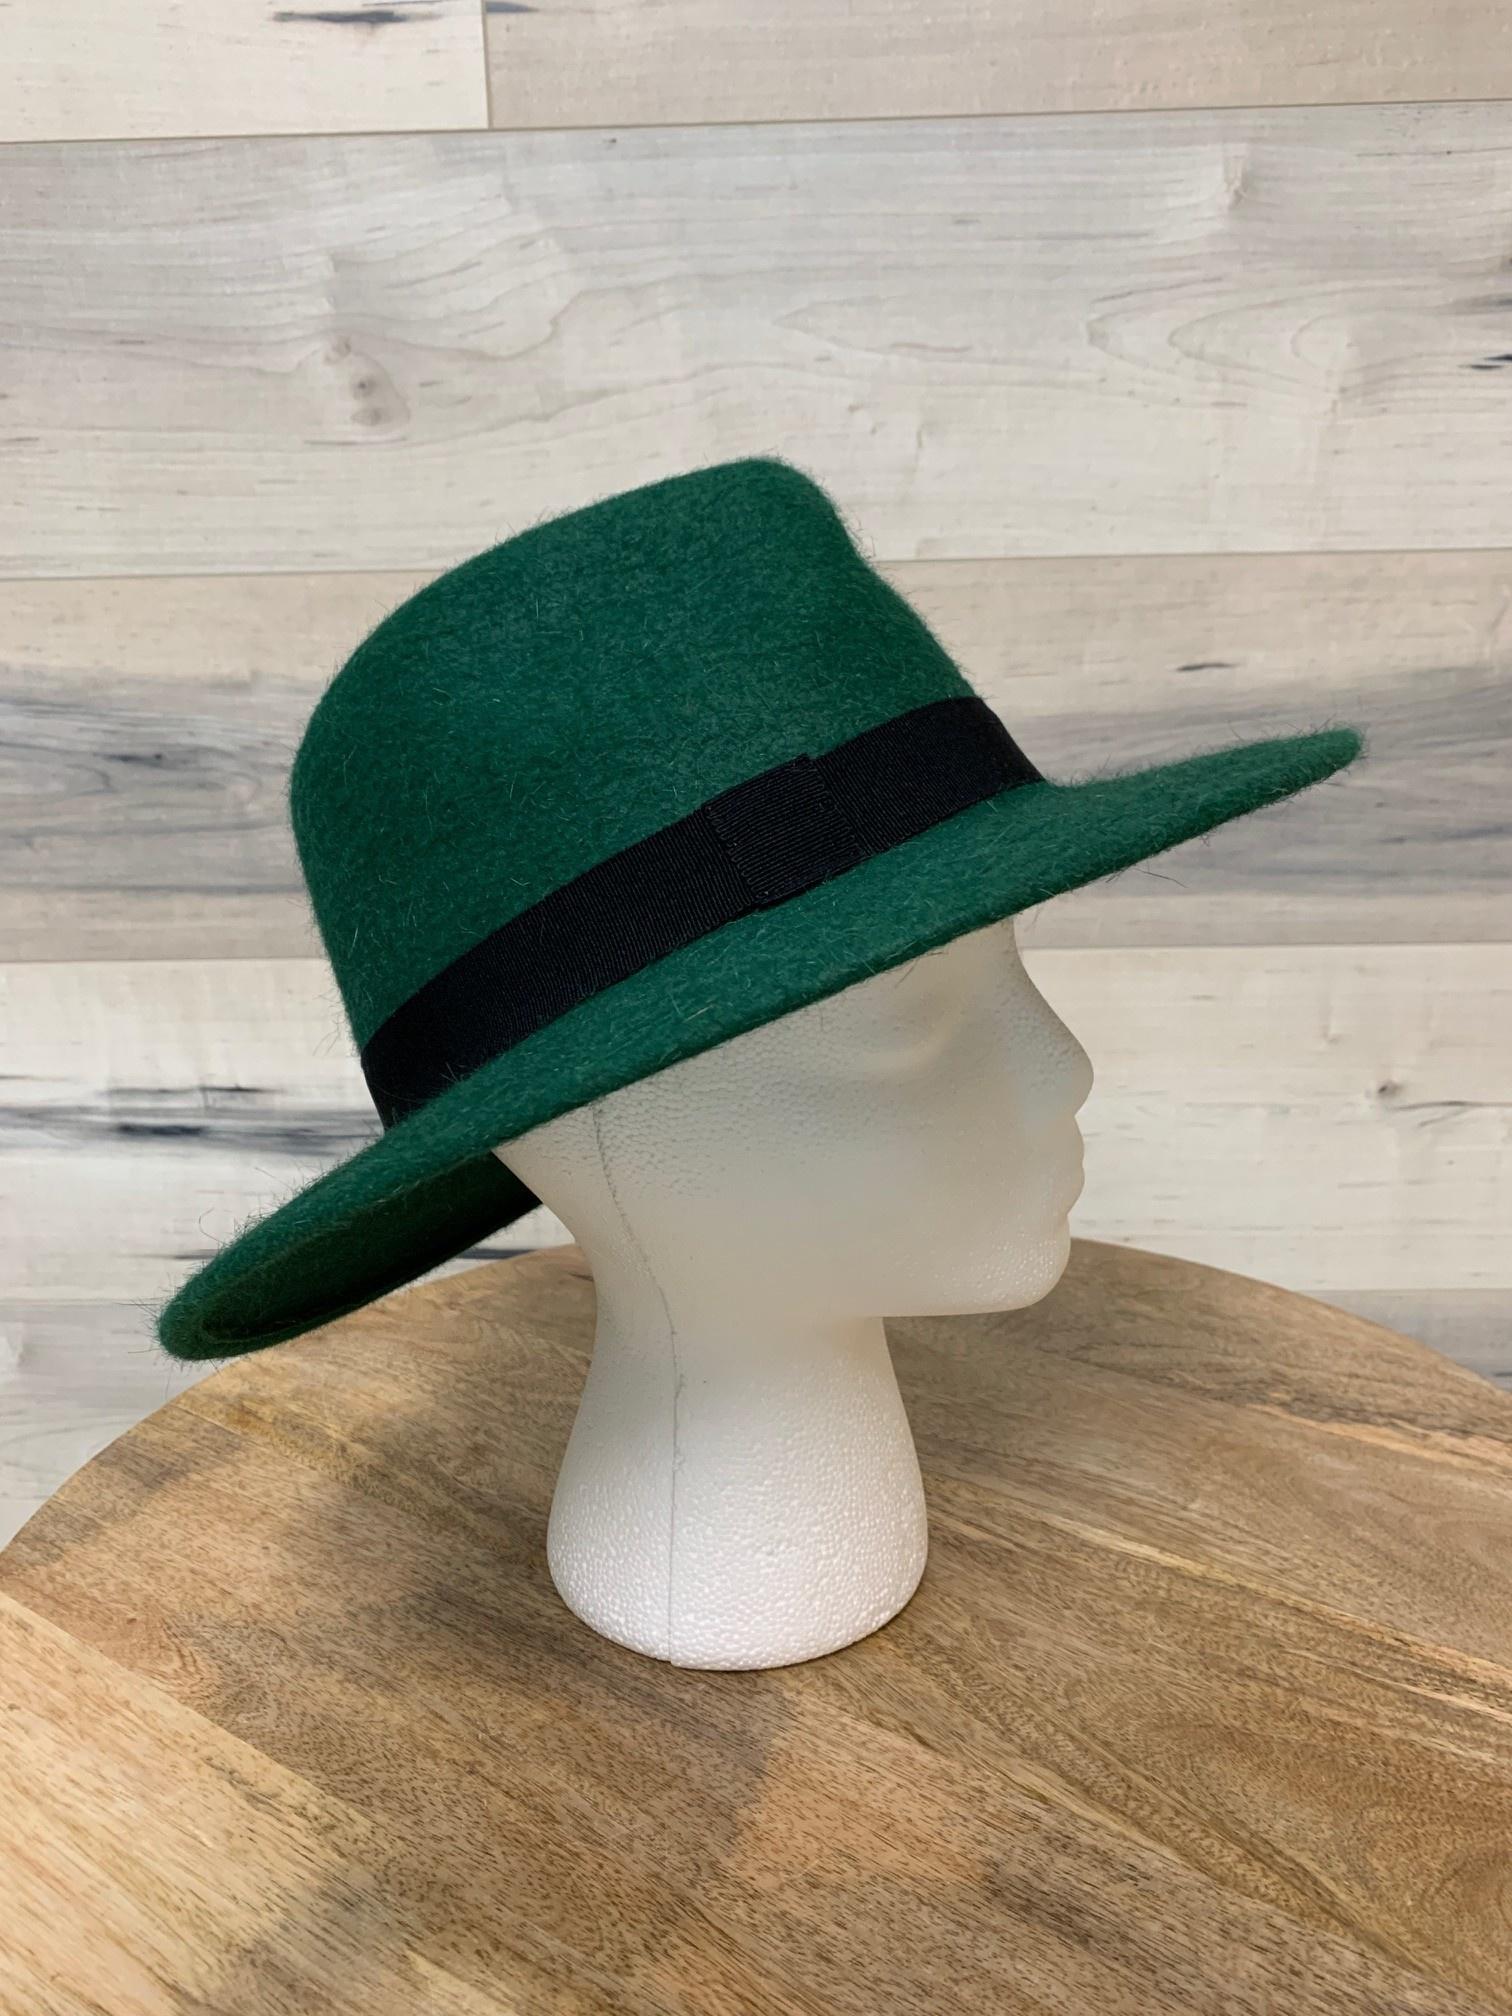 Forest Green Textured Felt Hat with Black Trim